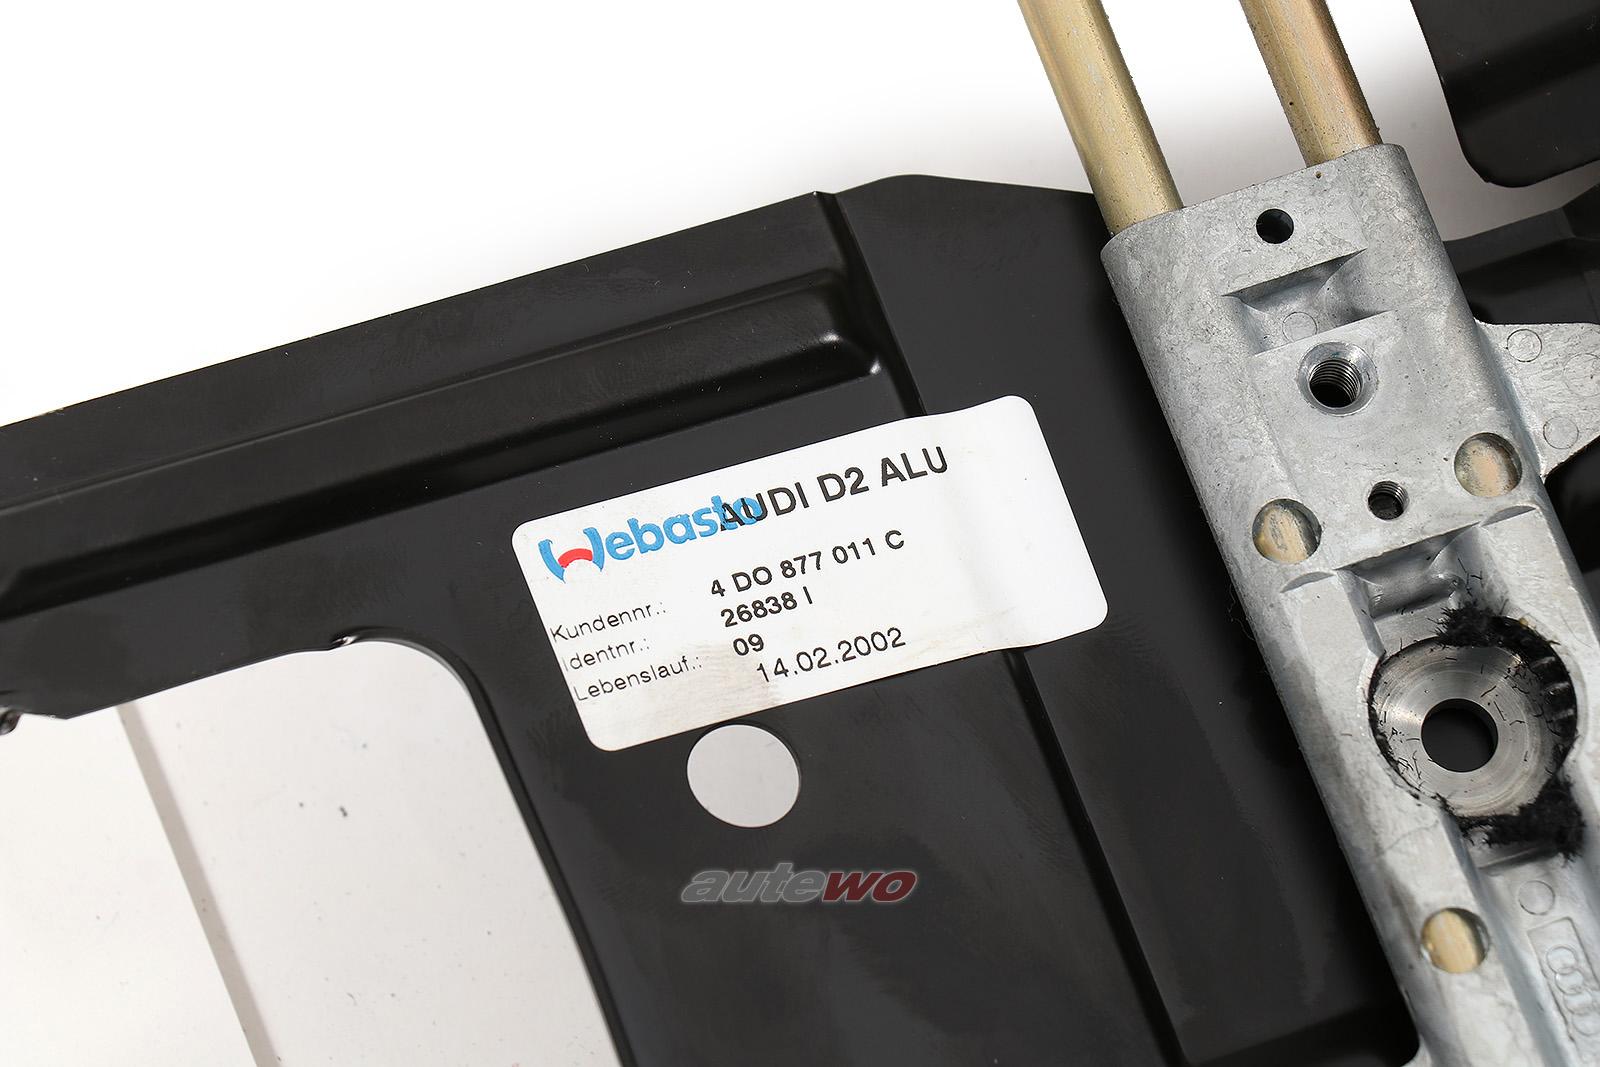 4D0877011C Audi A8/S8 D2 Alu-Schiebedach mit Kulissenführung